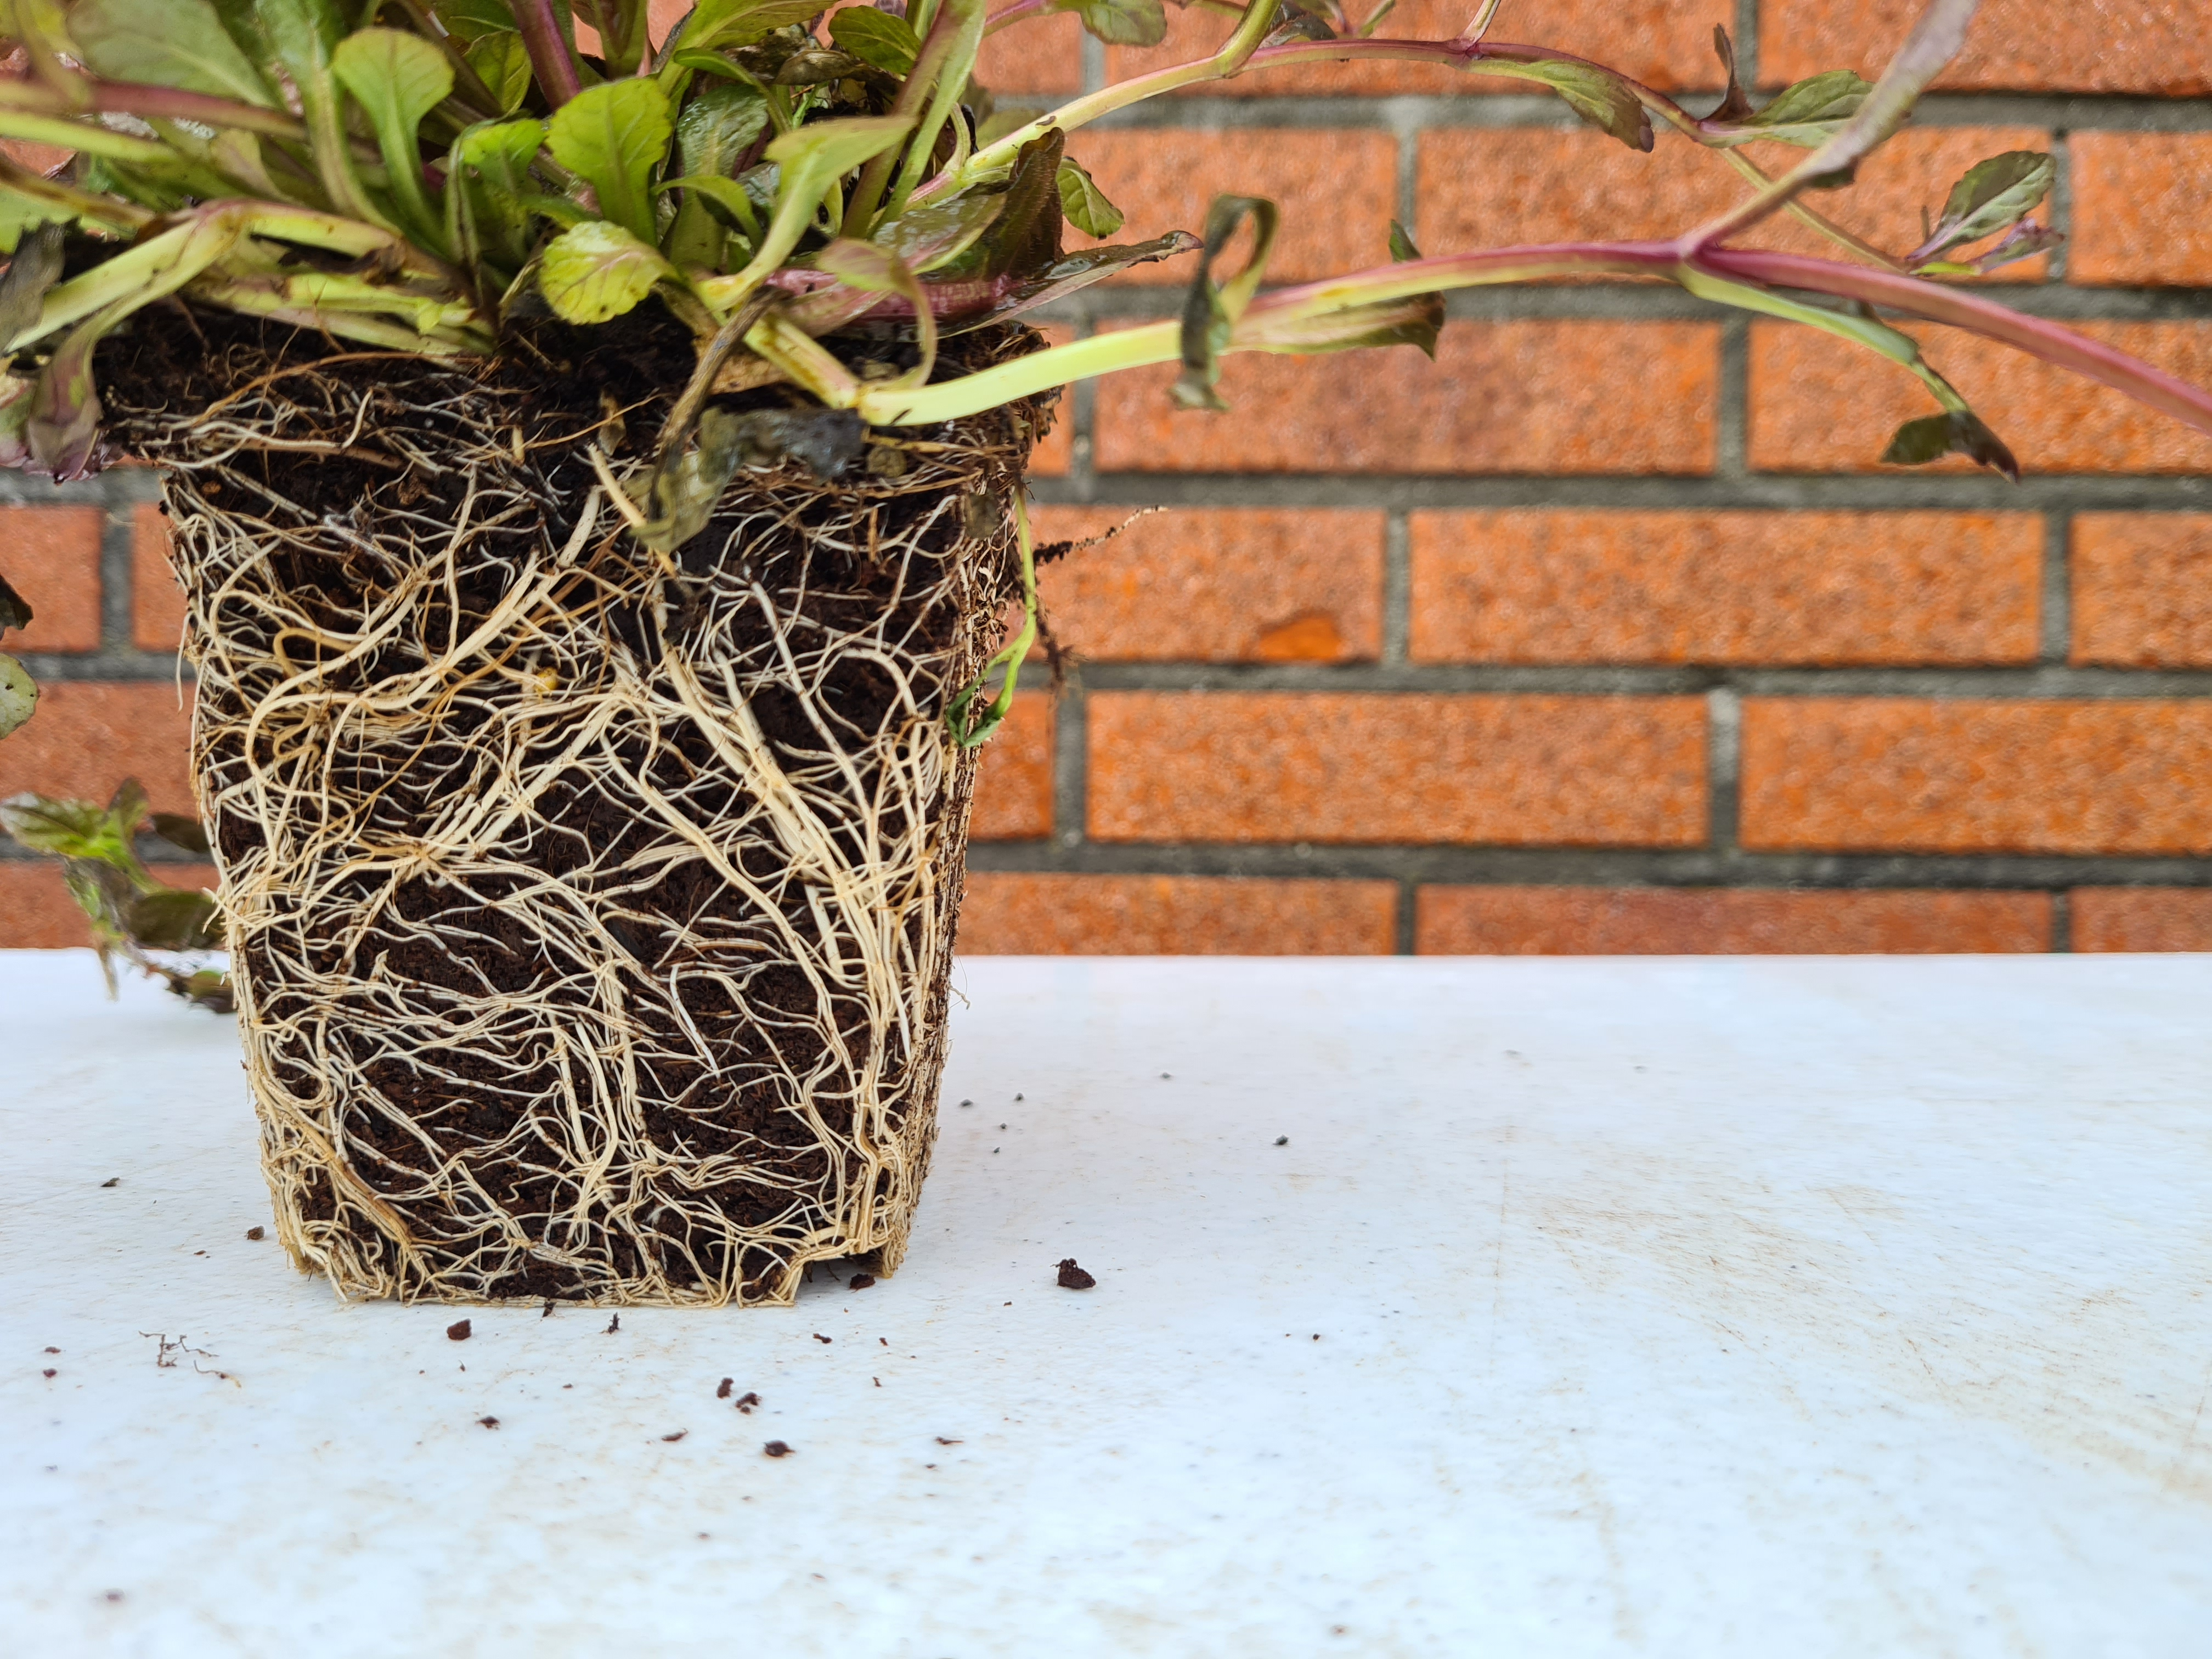 Kwaliteit tuinplanten yarinde borderpakket